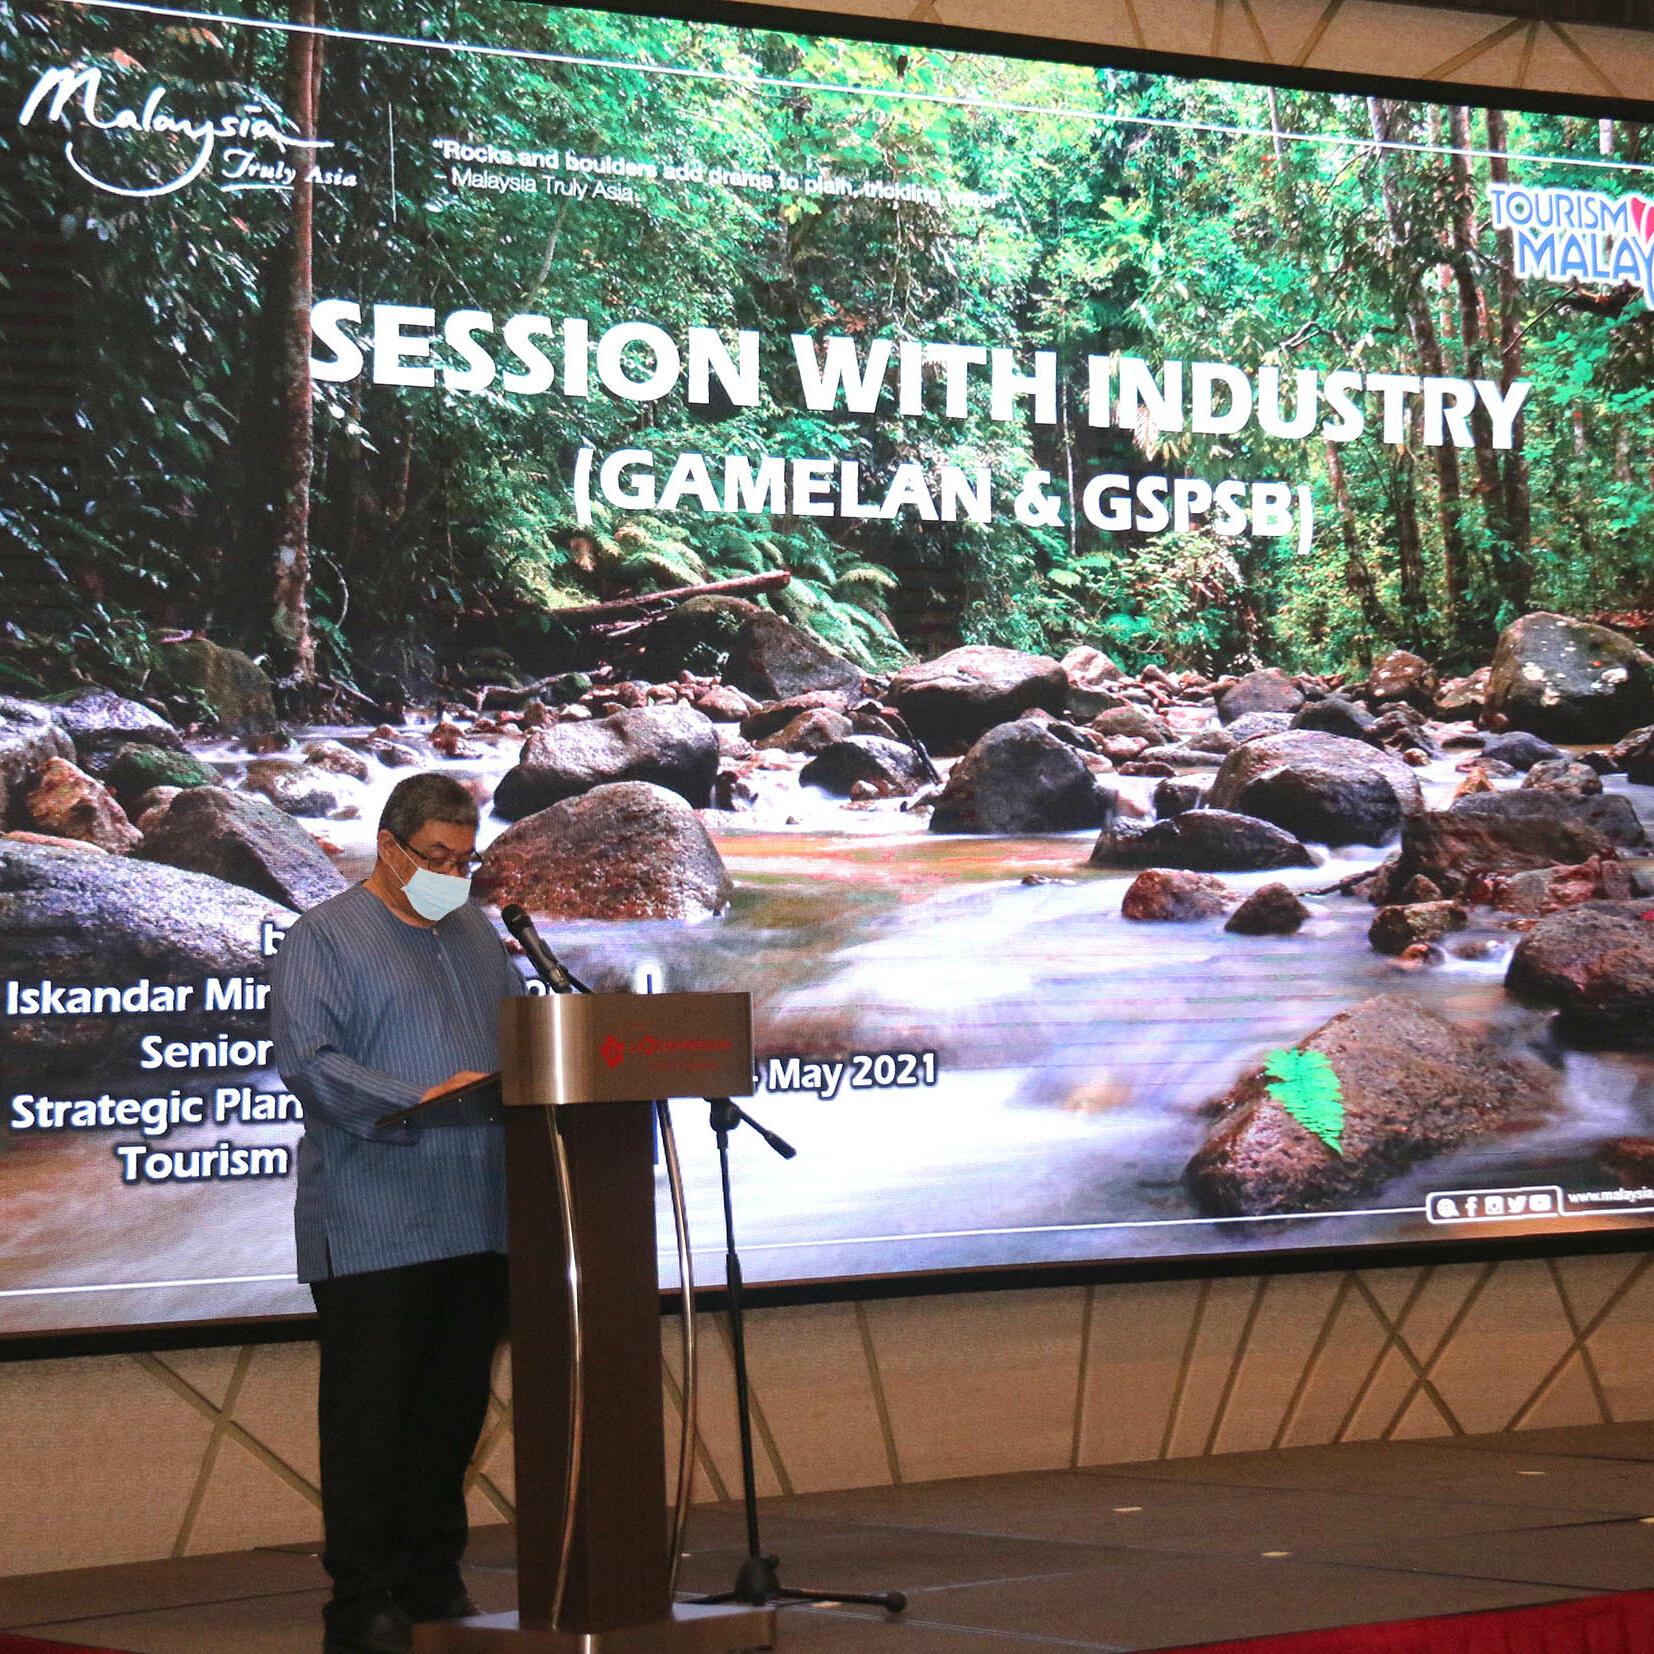 Lexis Hibiscus Chosen as Host for Glitzy Tourism Malaysia Affair